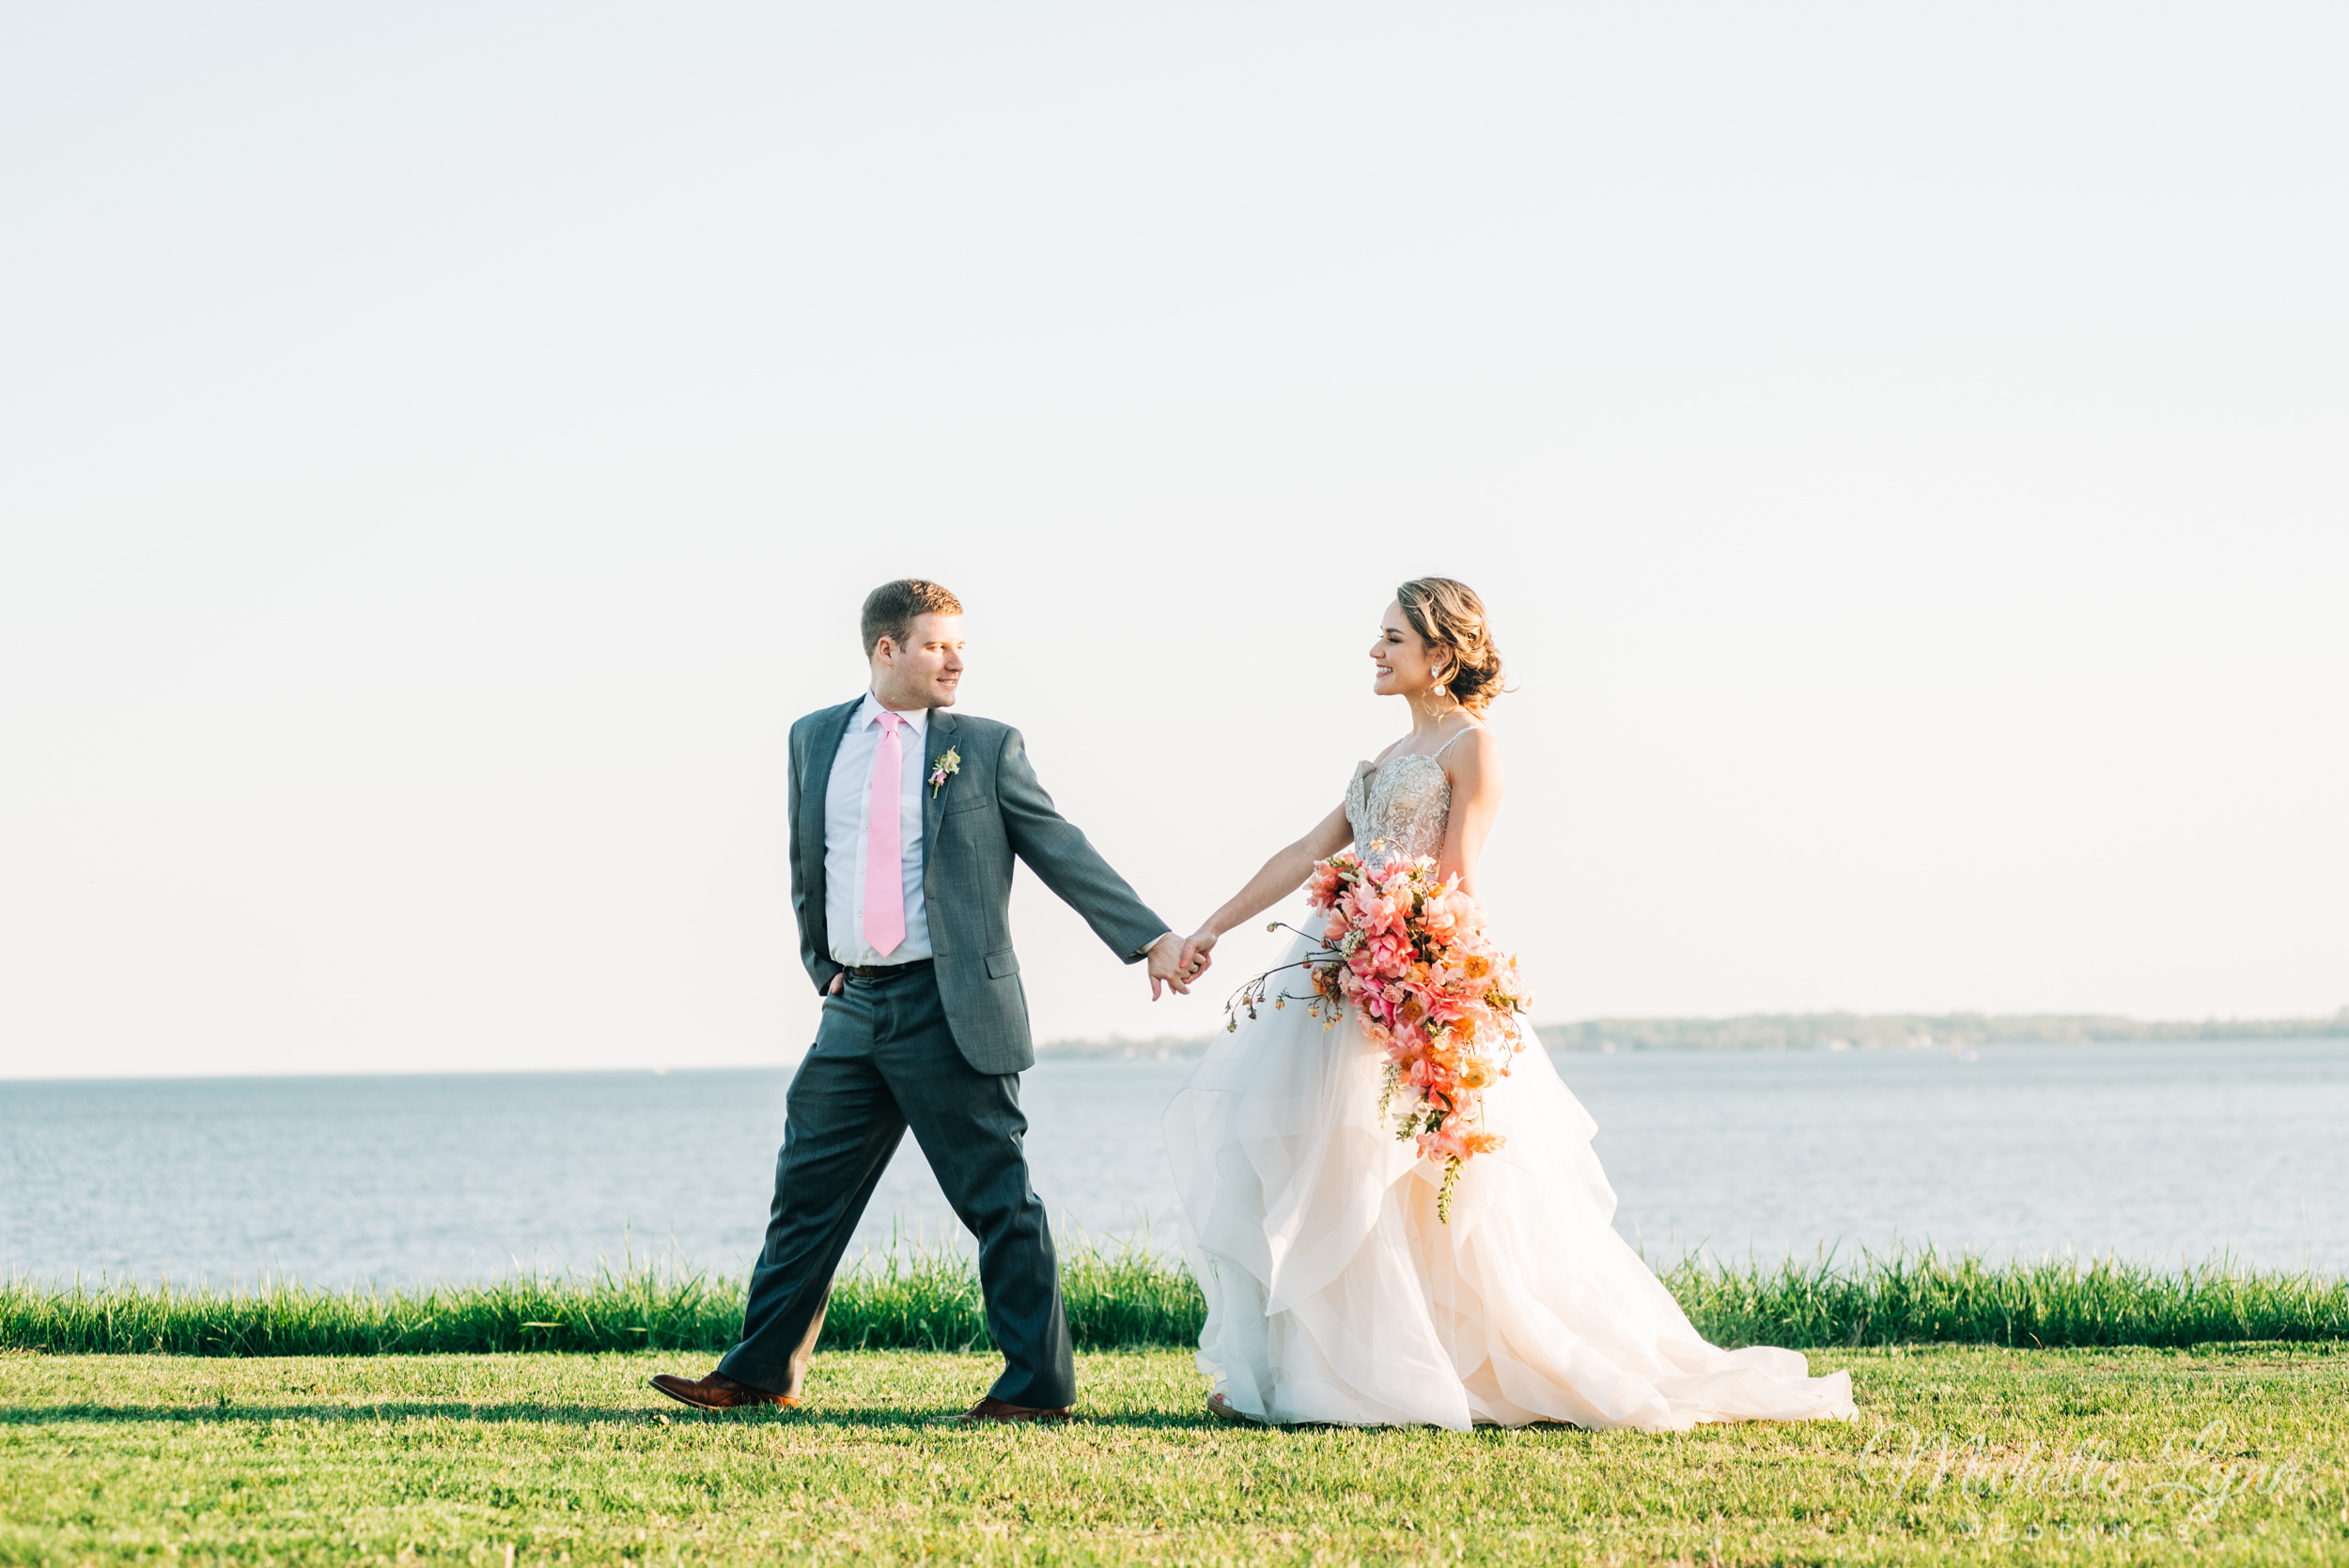 mlw-whitehall-annapolis-maryland-wedding-44.jpg